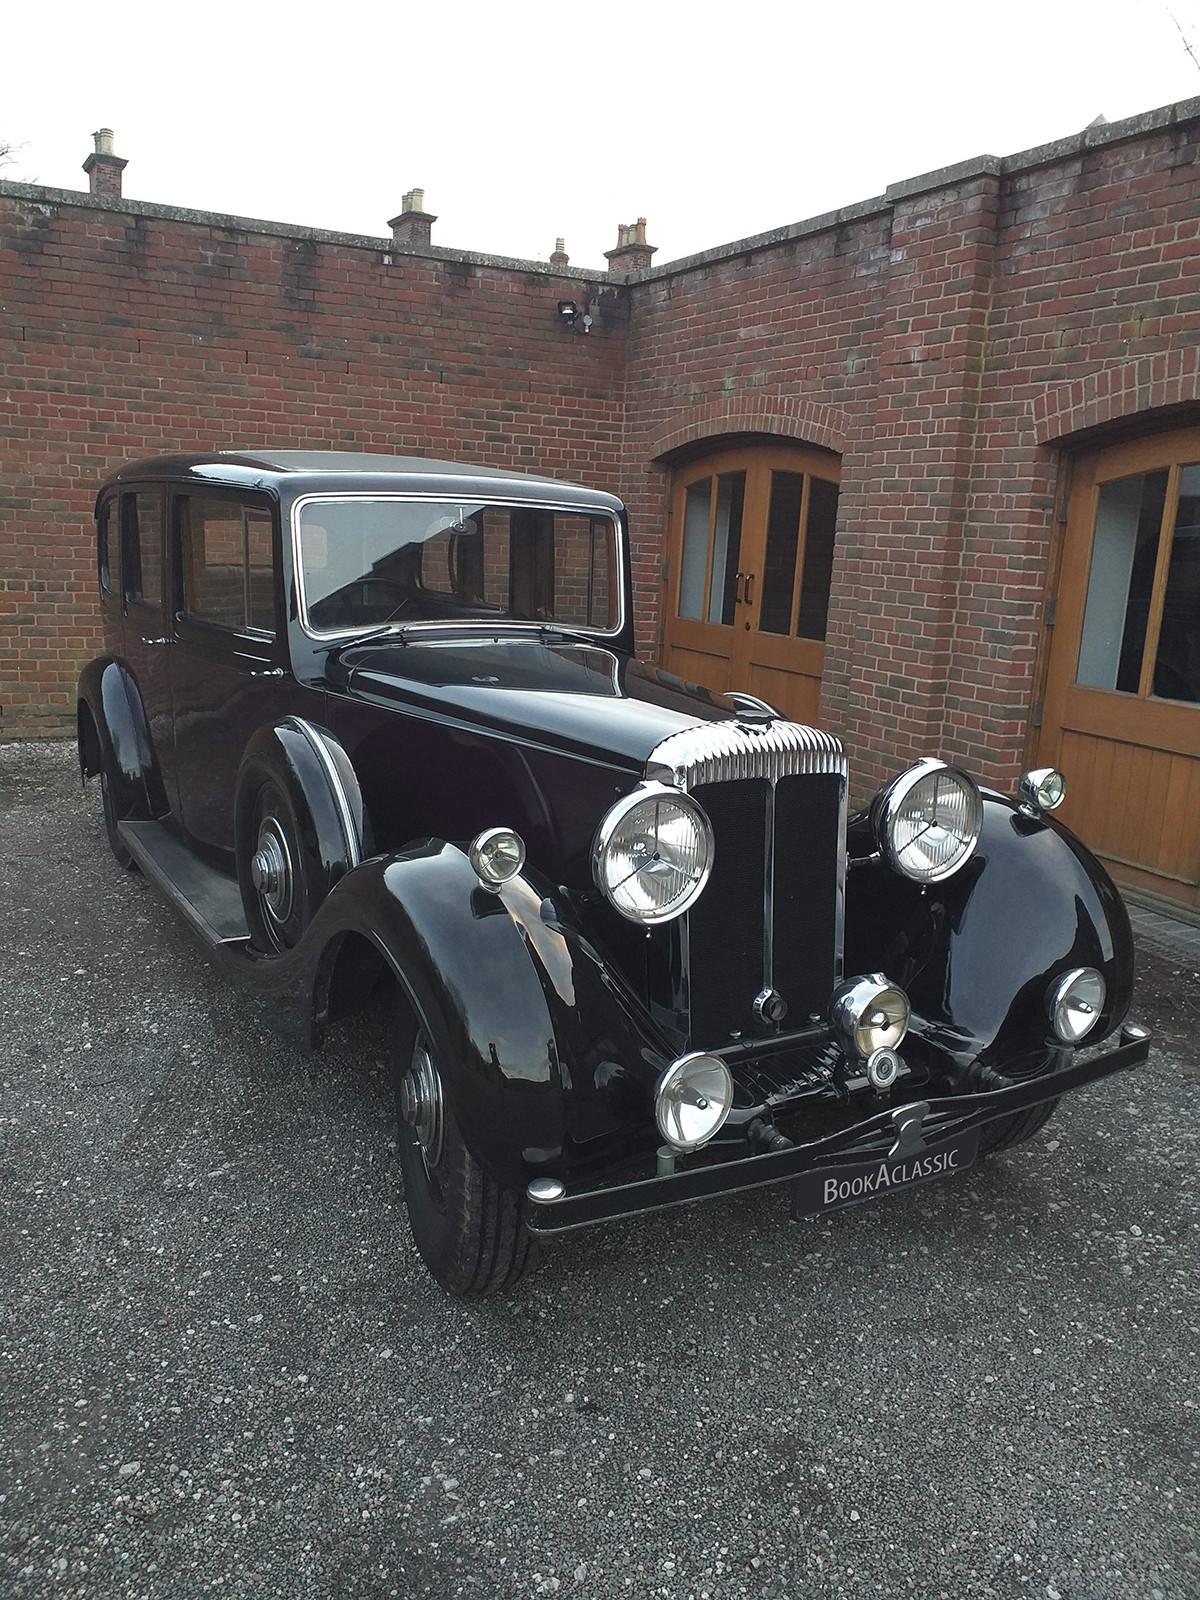 Daimler Straight 8 Limousine Hire Altrincham